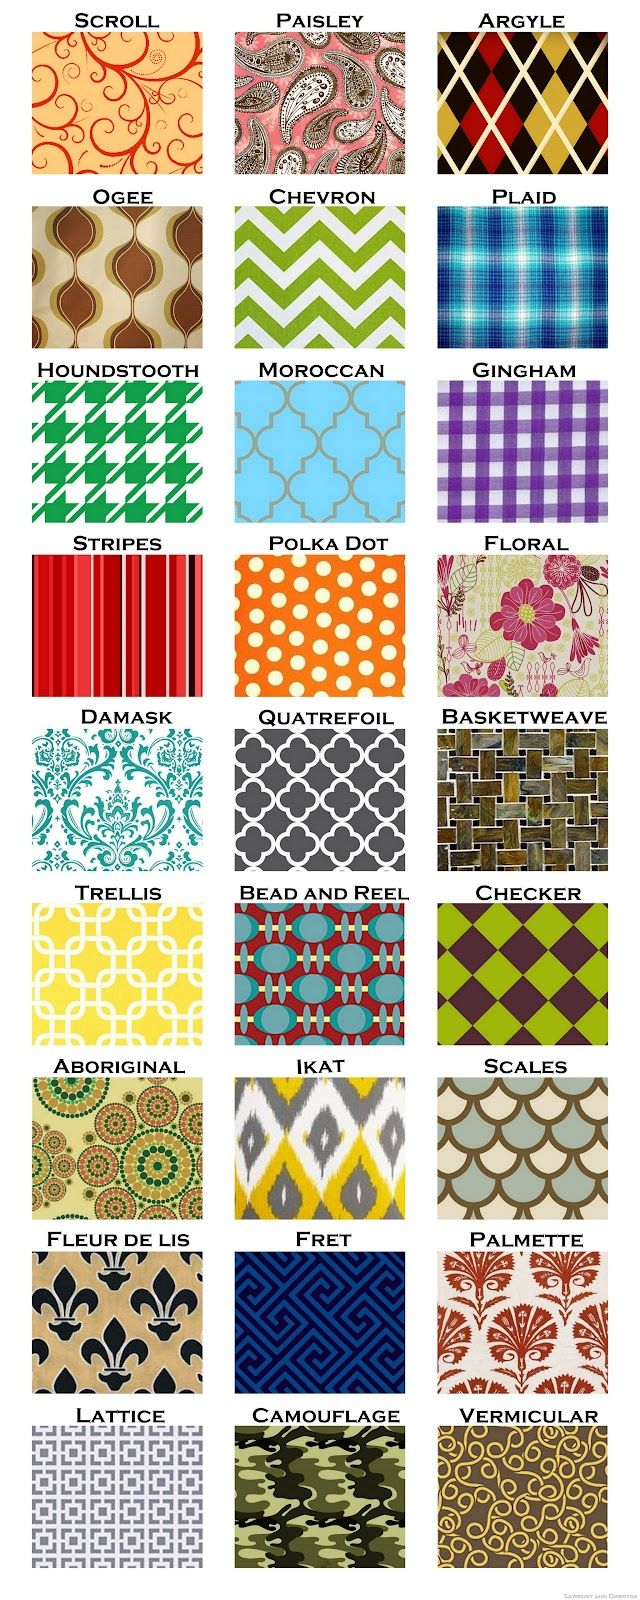 Pattern types.